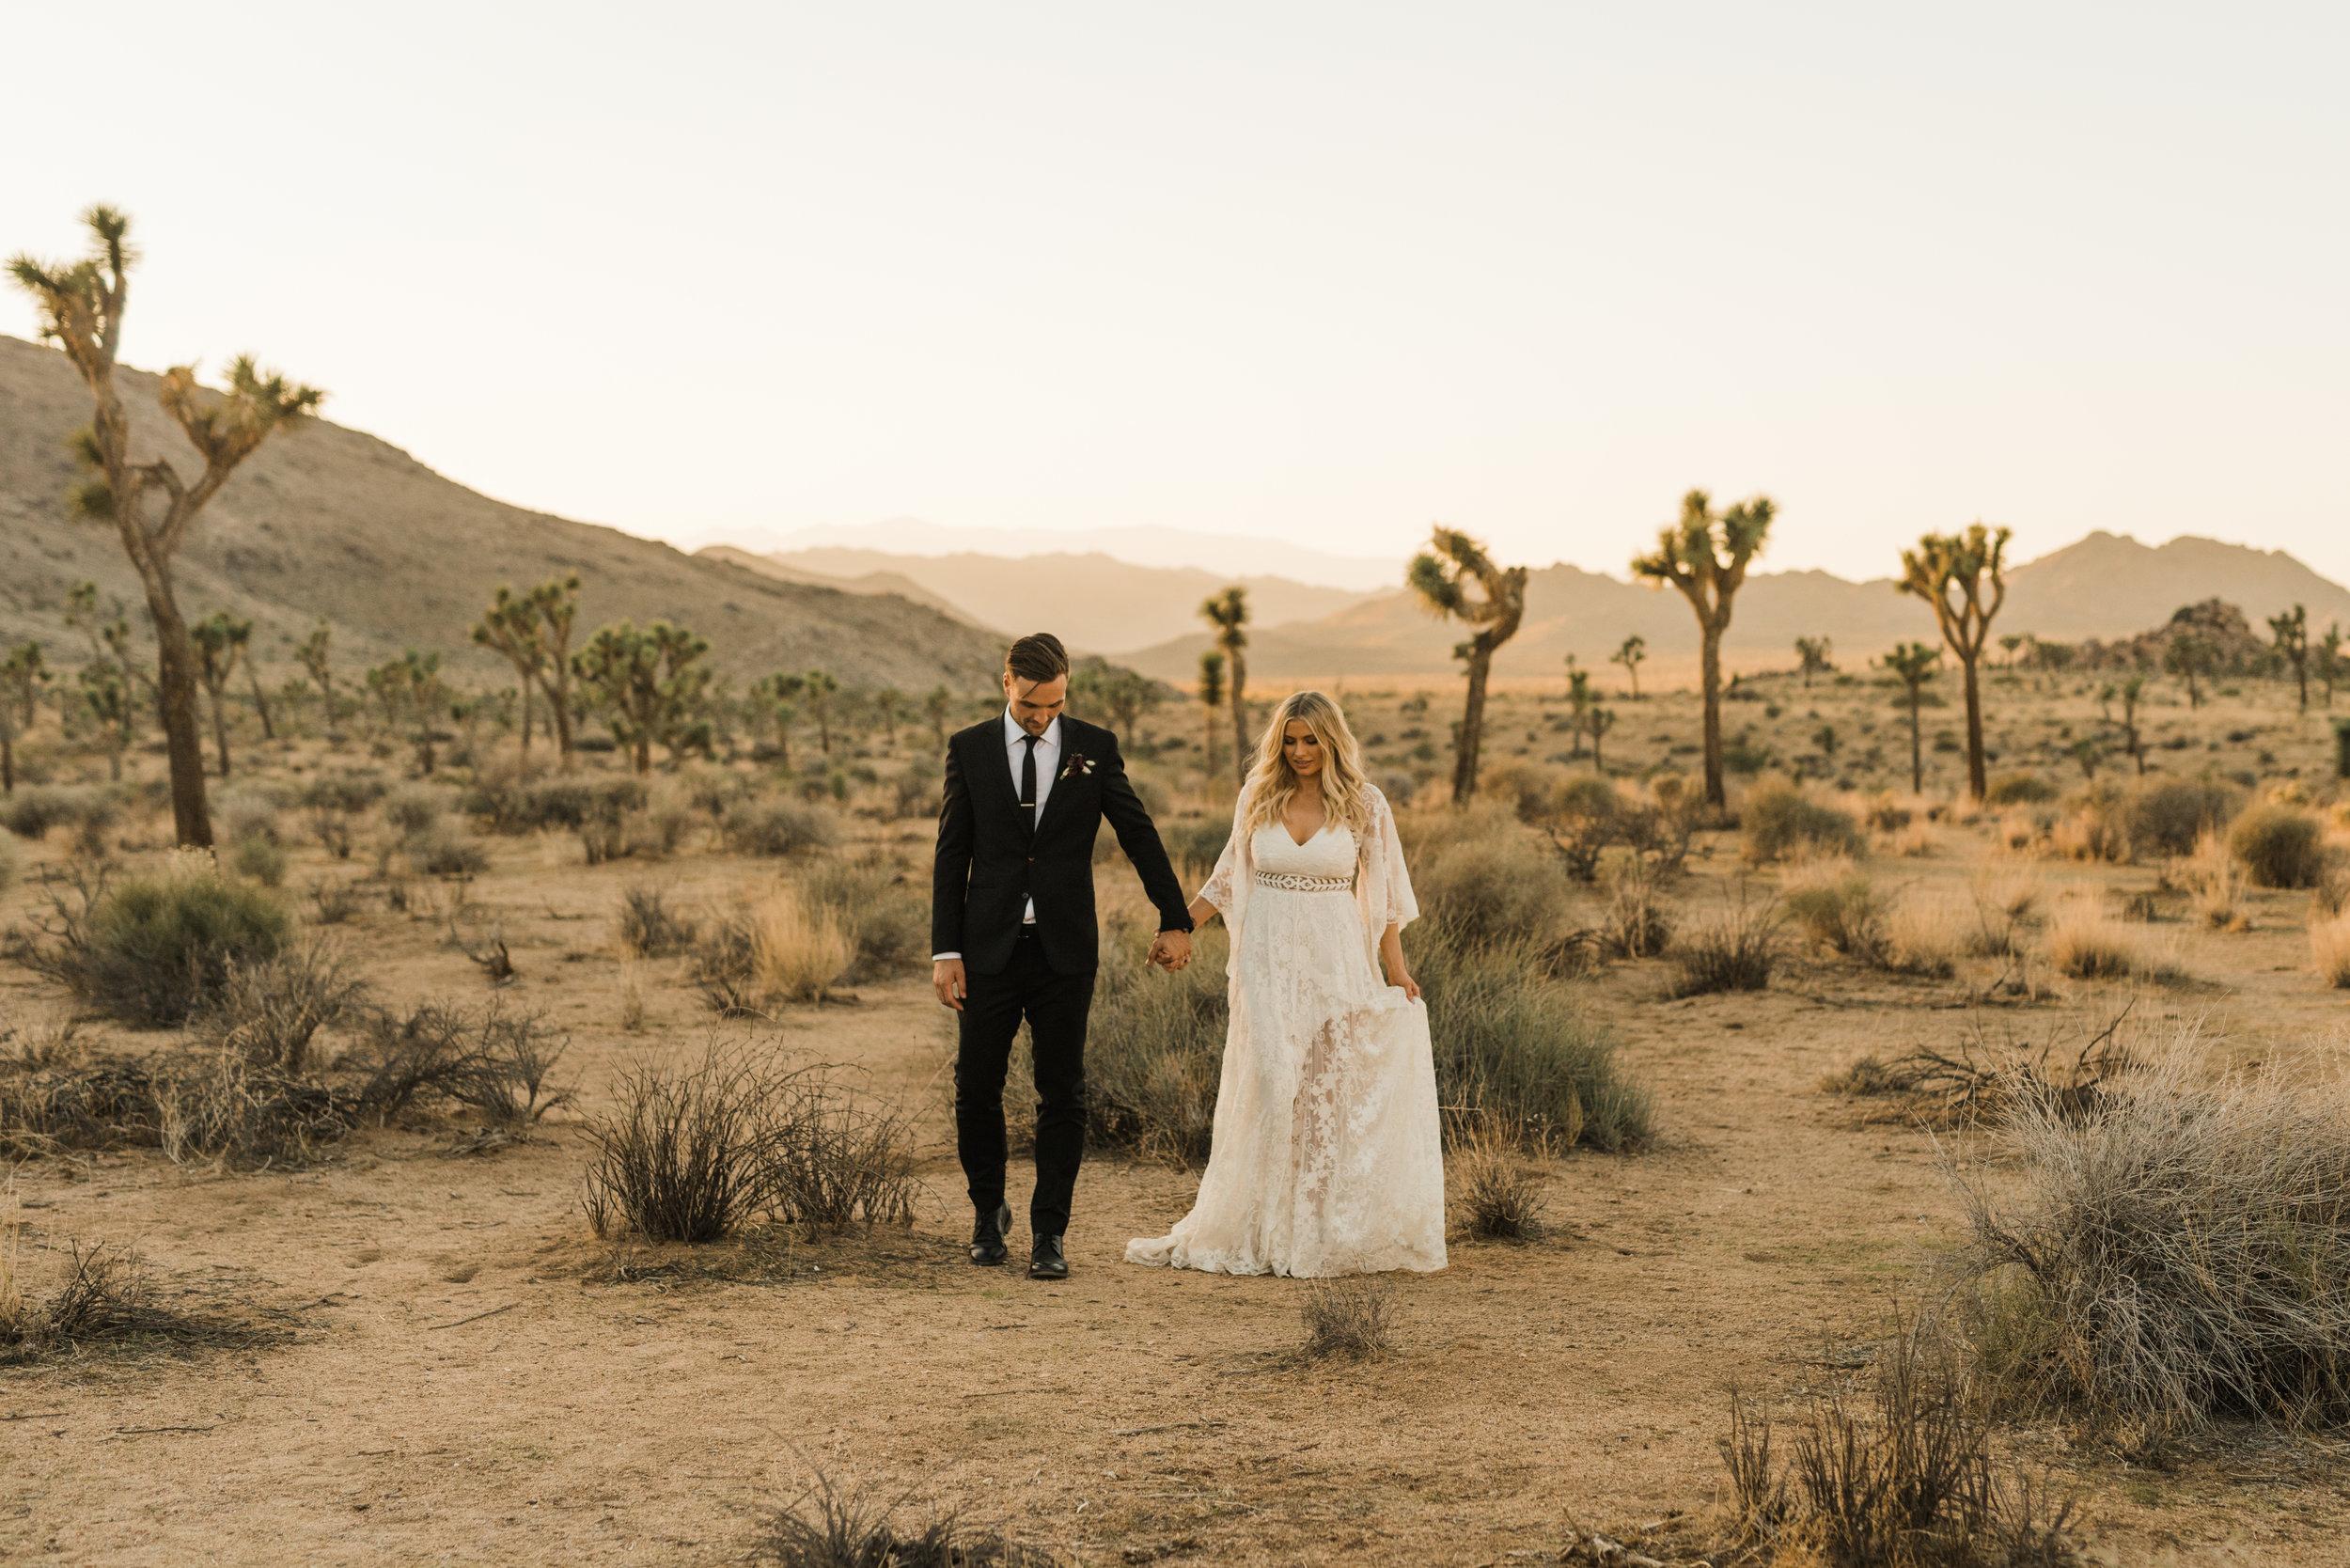 Joshua Tree Desert Elopement Wedding